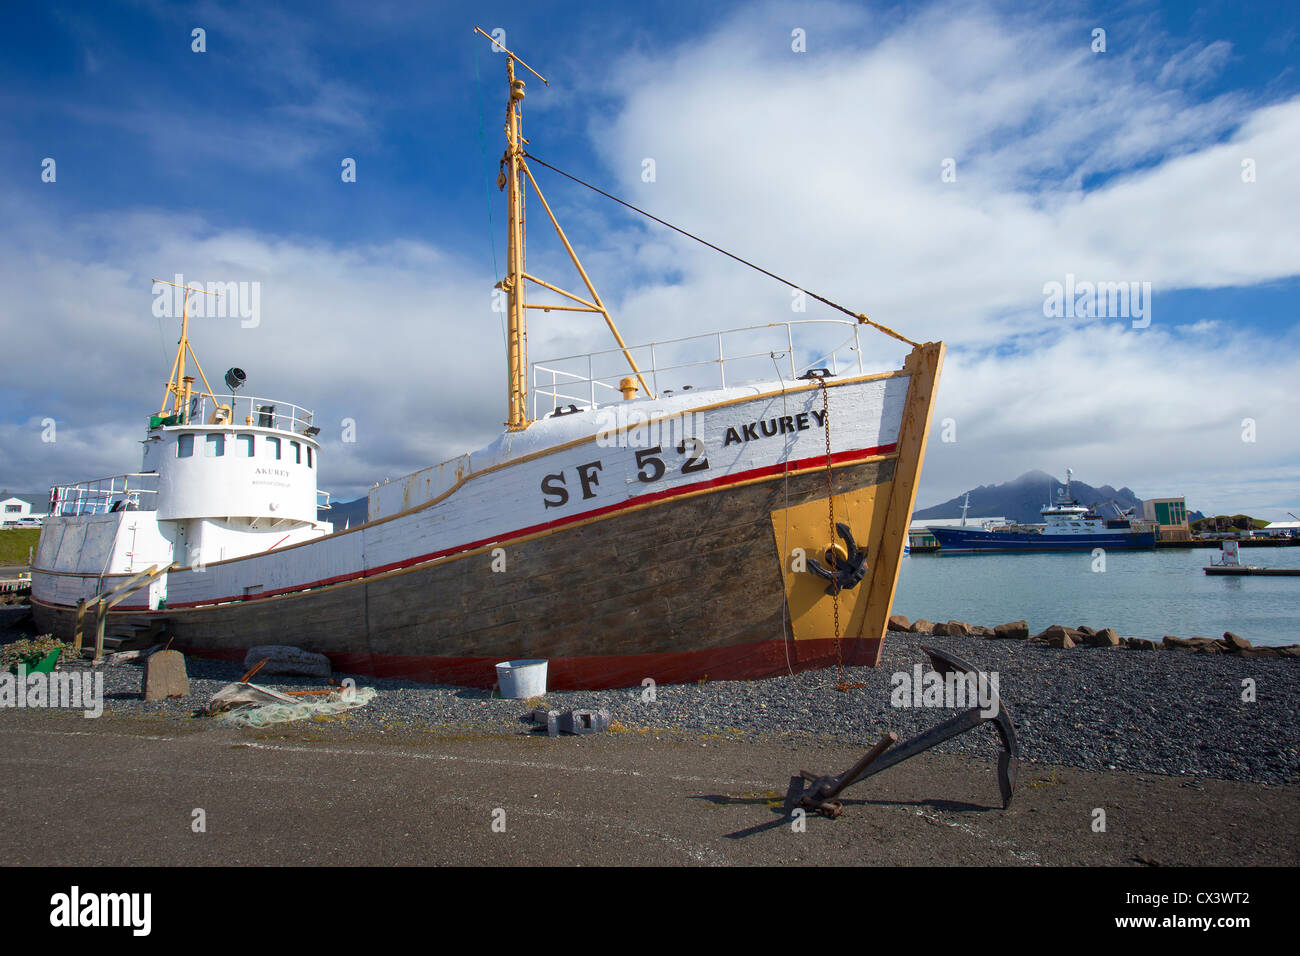 Fishing Vessel, SF 52 Akurey, on display as a monument at Hofn Harbour (Höfn Í Hornafirđi), South East - Stock Image